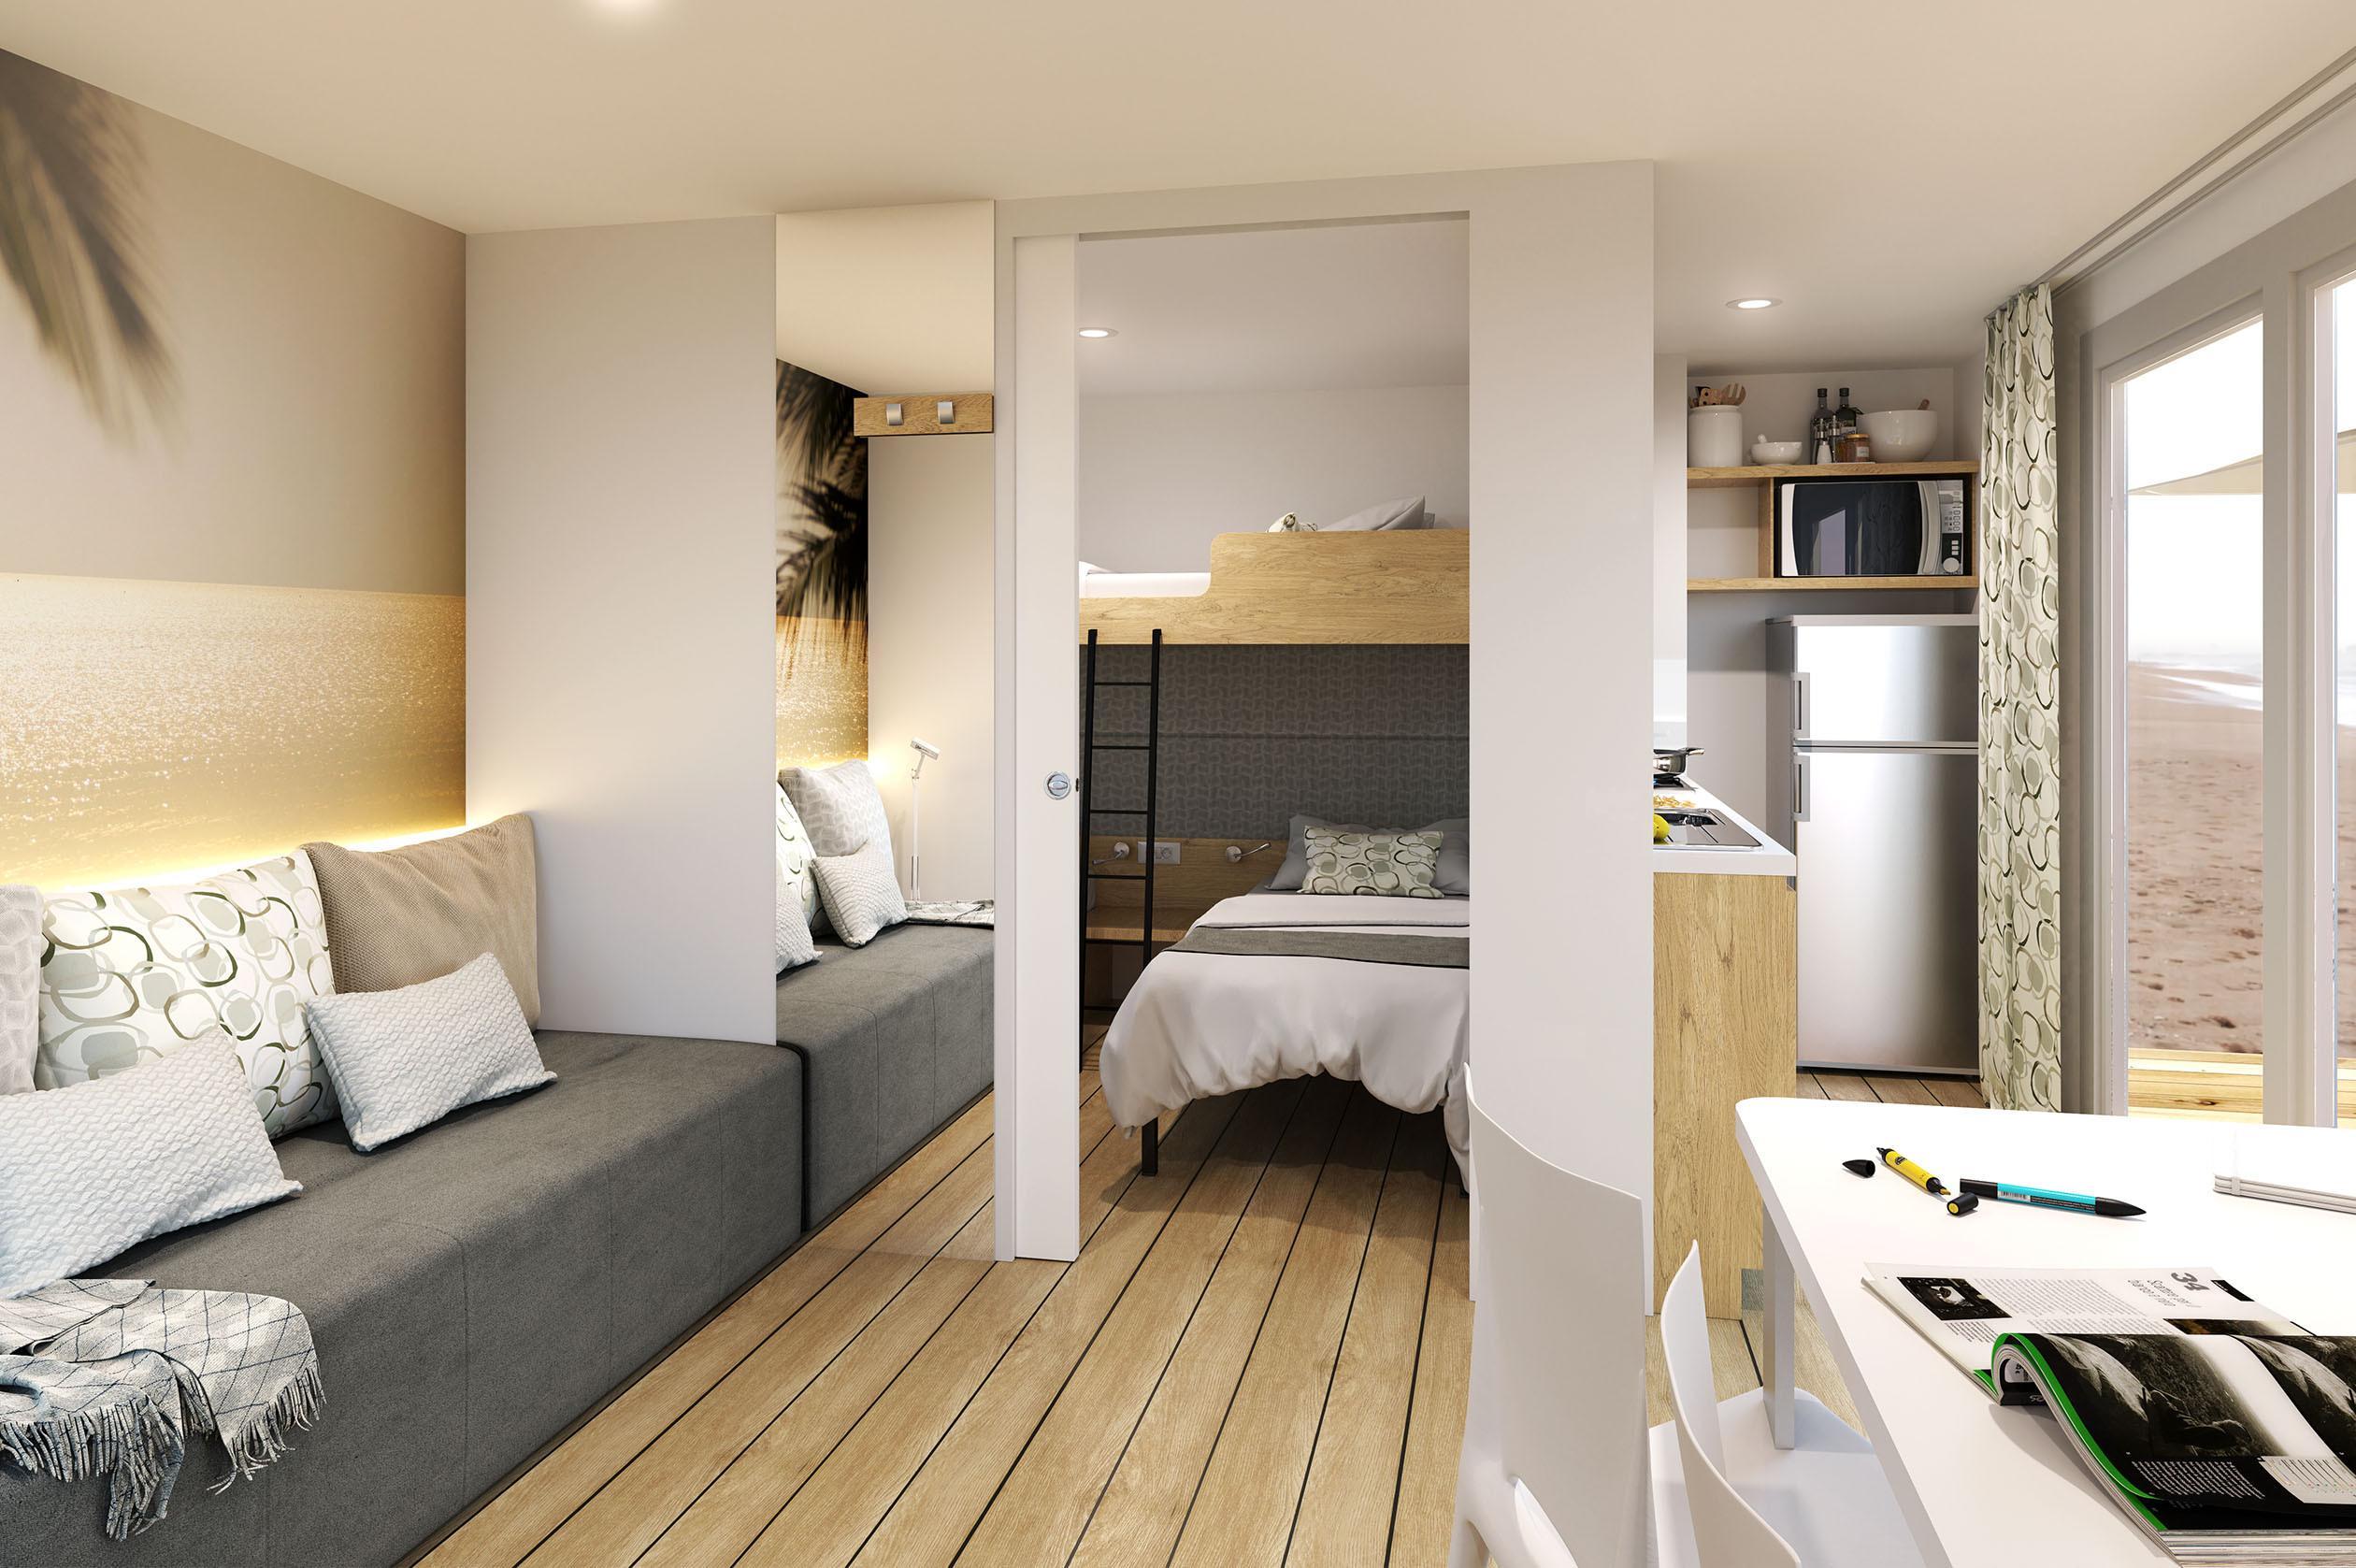 adria mobilehomes o adrii the leading european manufacturer of mobile homes modular homes. Black Bedroom Furniture Sets. Home Design Ideas